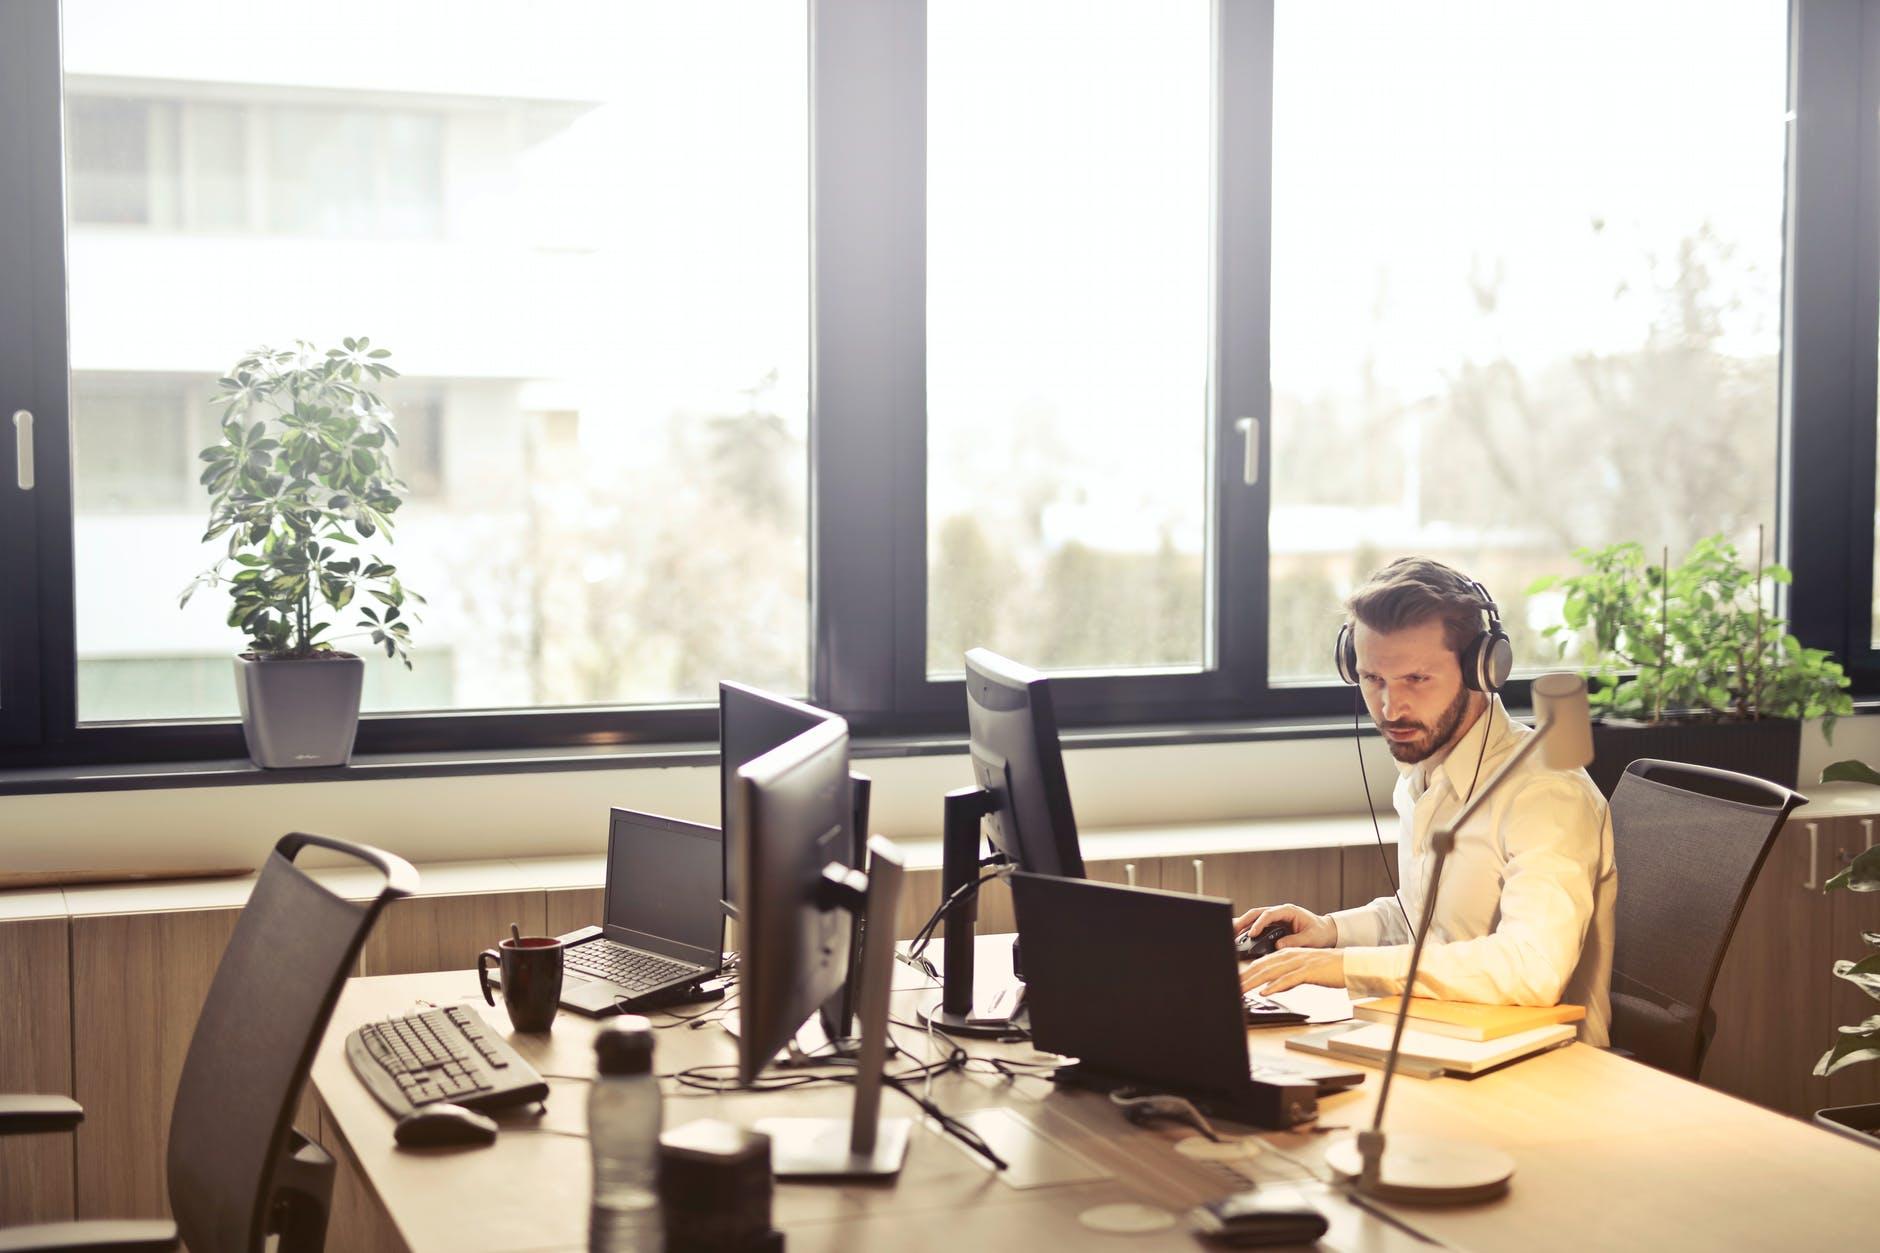 man with headphones facing computer monitor